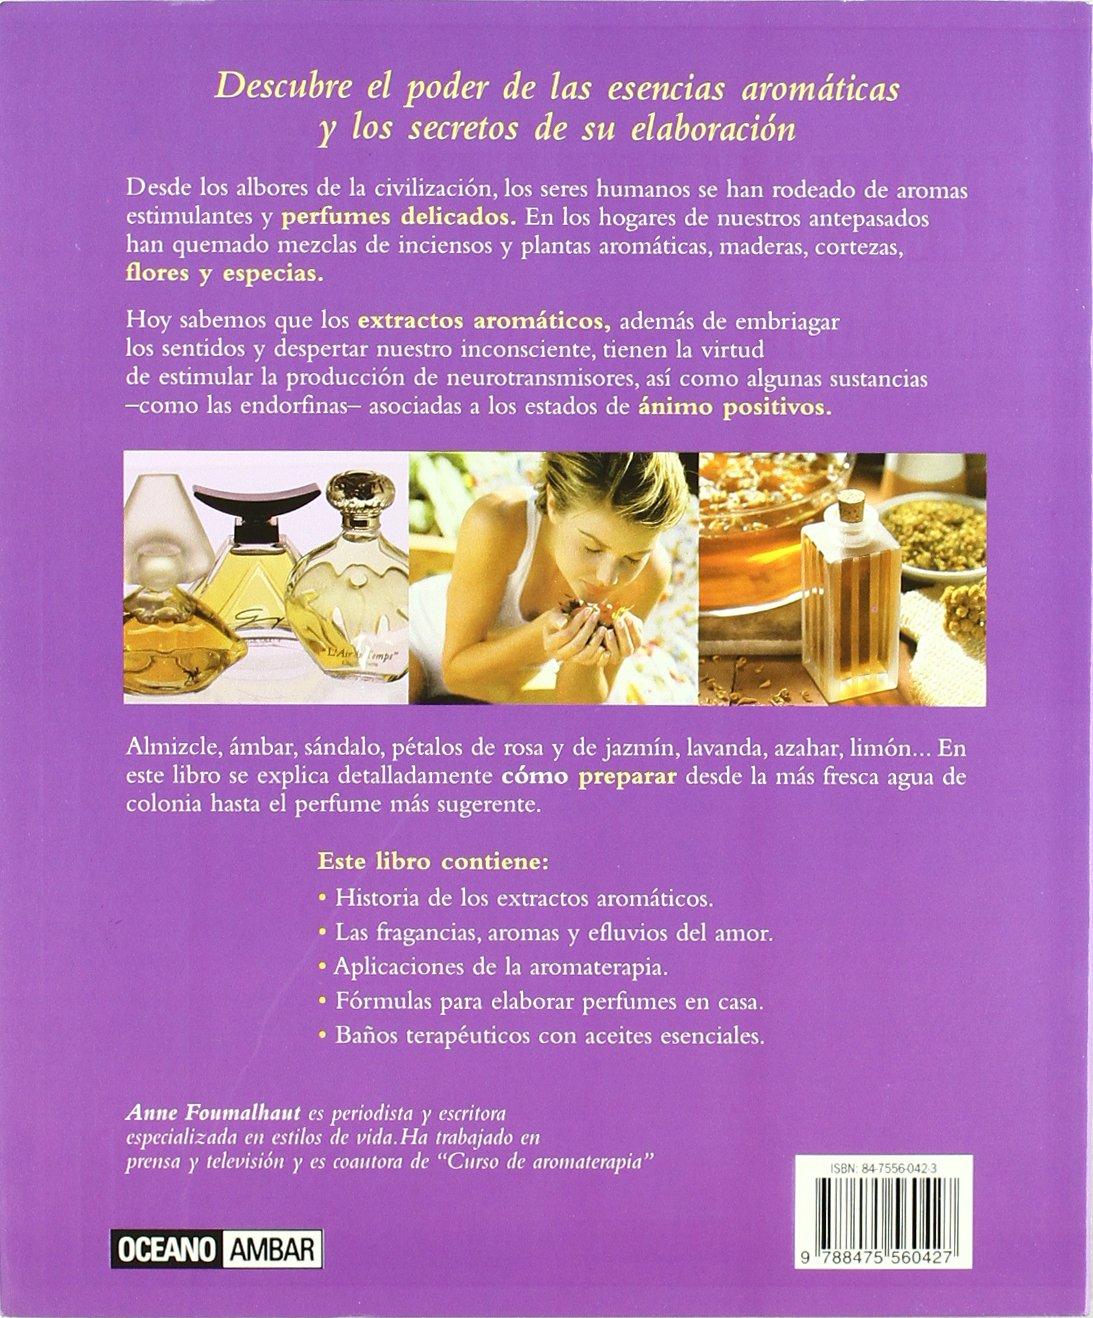 Perfumes y Aceites Esenciales: FOUMALHAUT ANN: 9788475560427: Amazon.com: Books